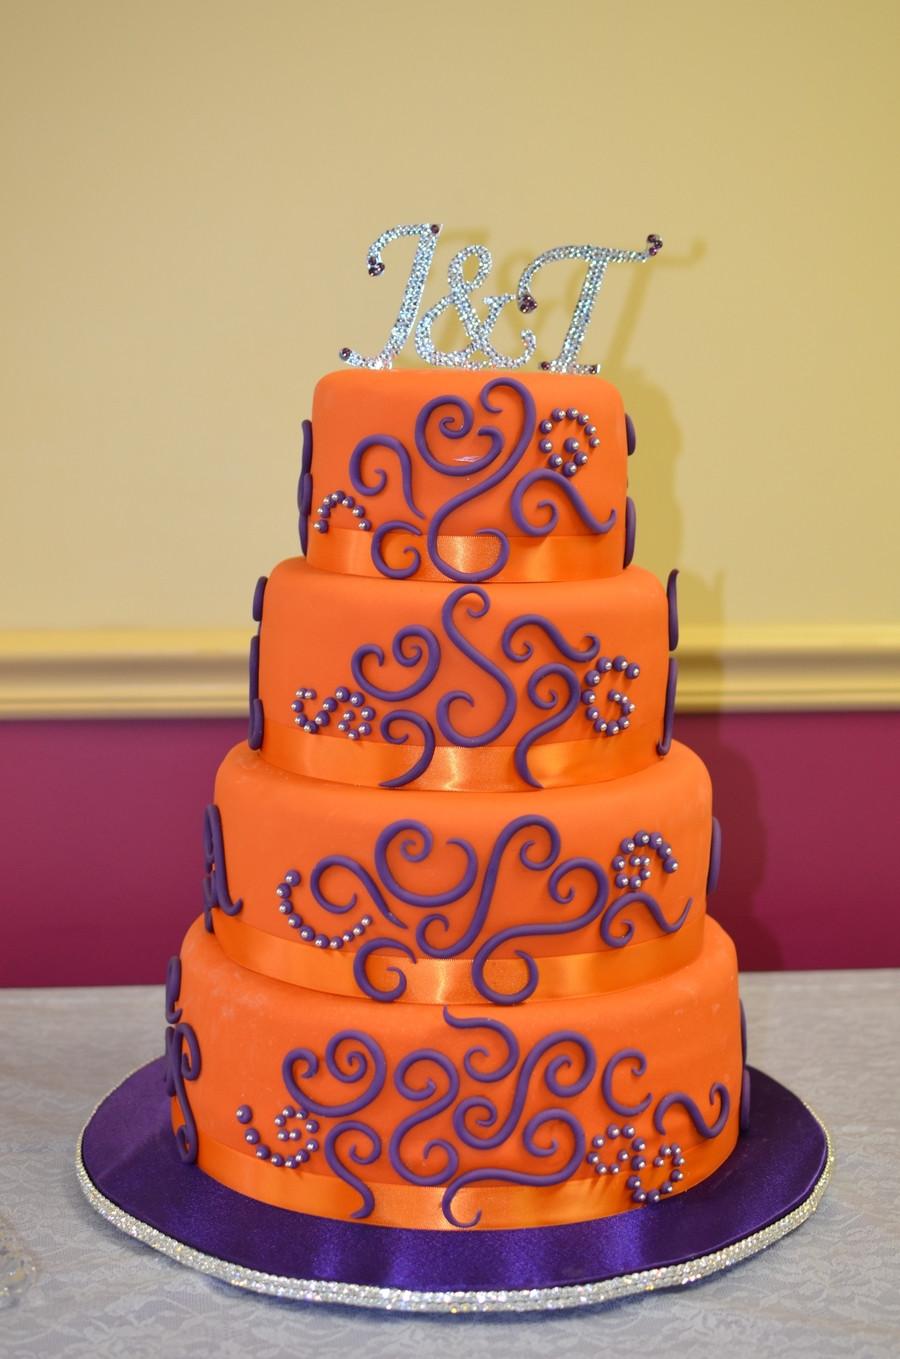 Orange And Purple Wedding Cakes  Orange And Purple Wedding Cake CakeCentral